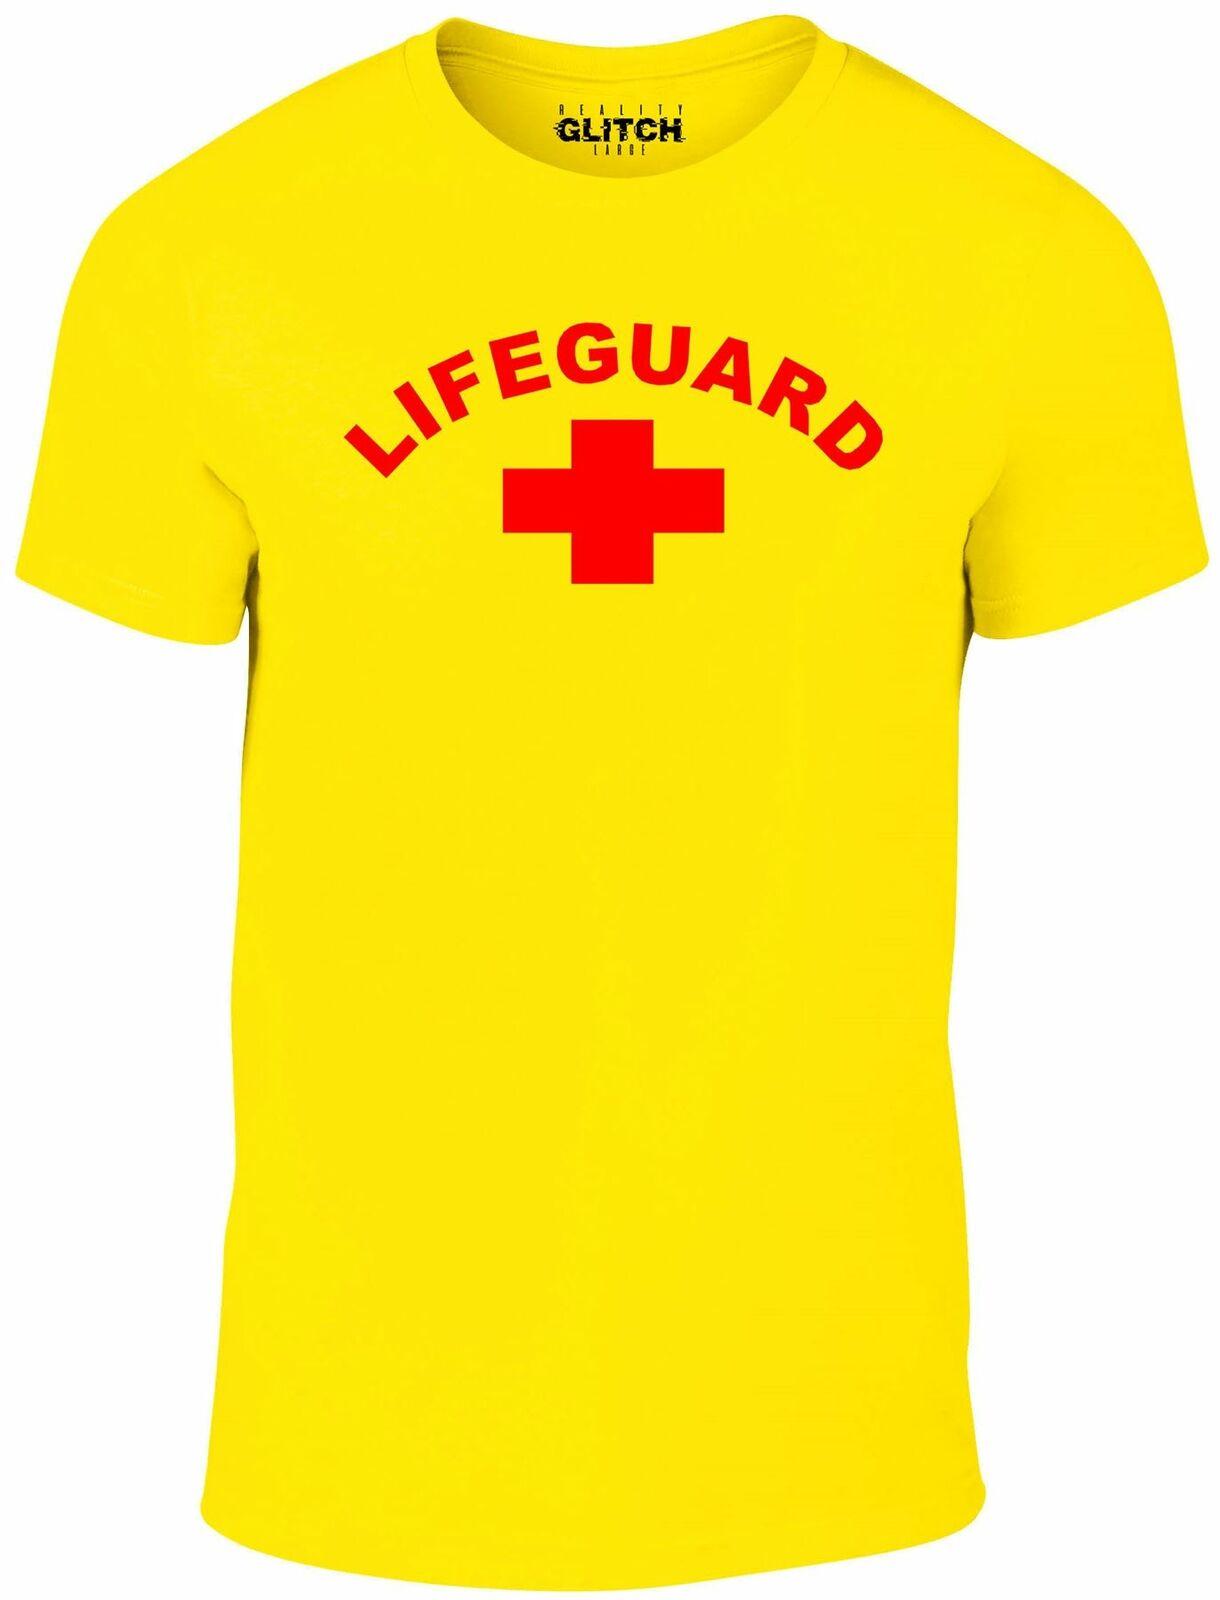 Homme sauveteur t-shirt Baywatch plage soleil surf Mitch piscine natation déguisement